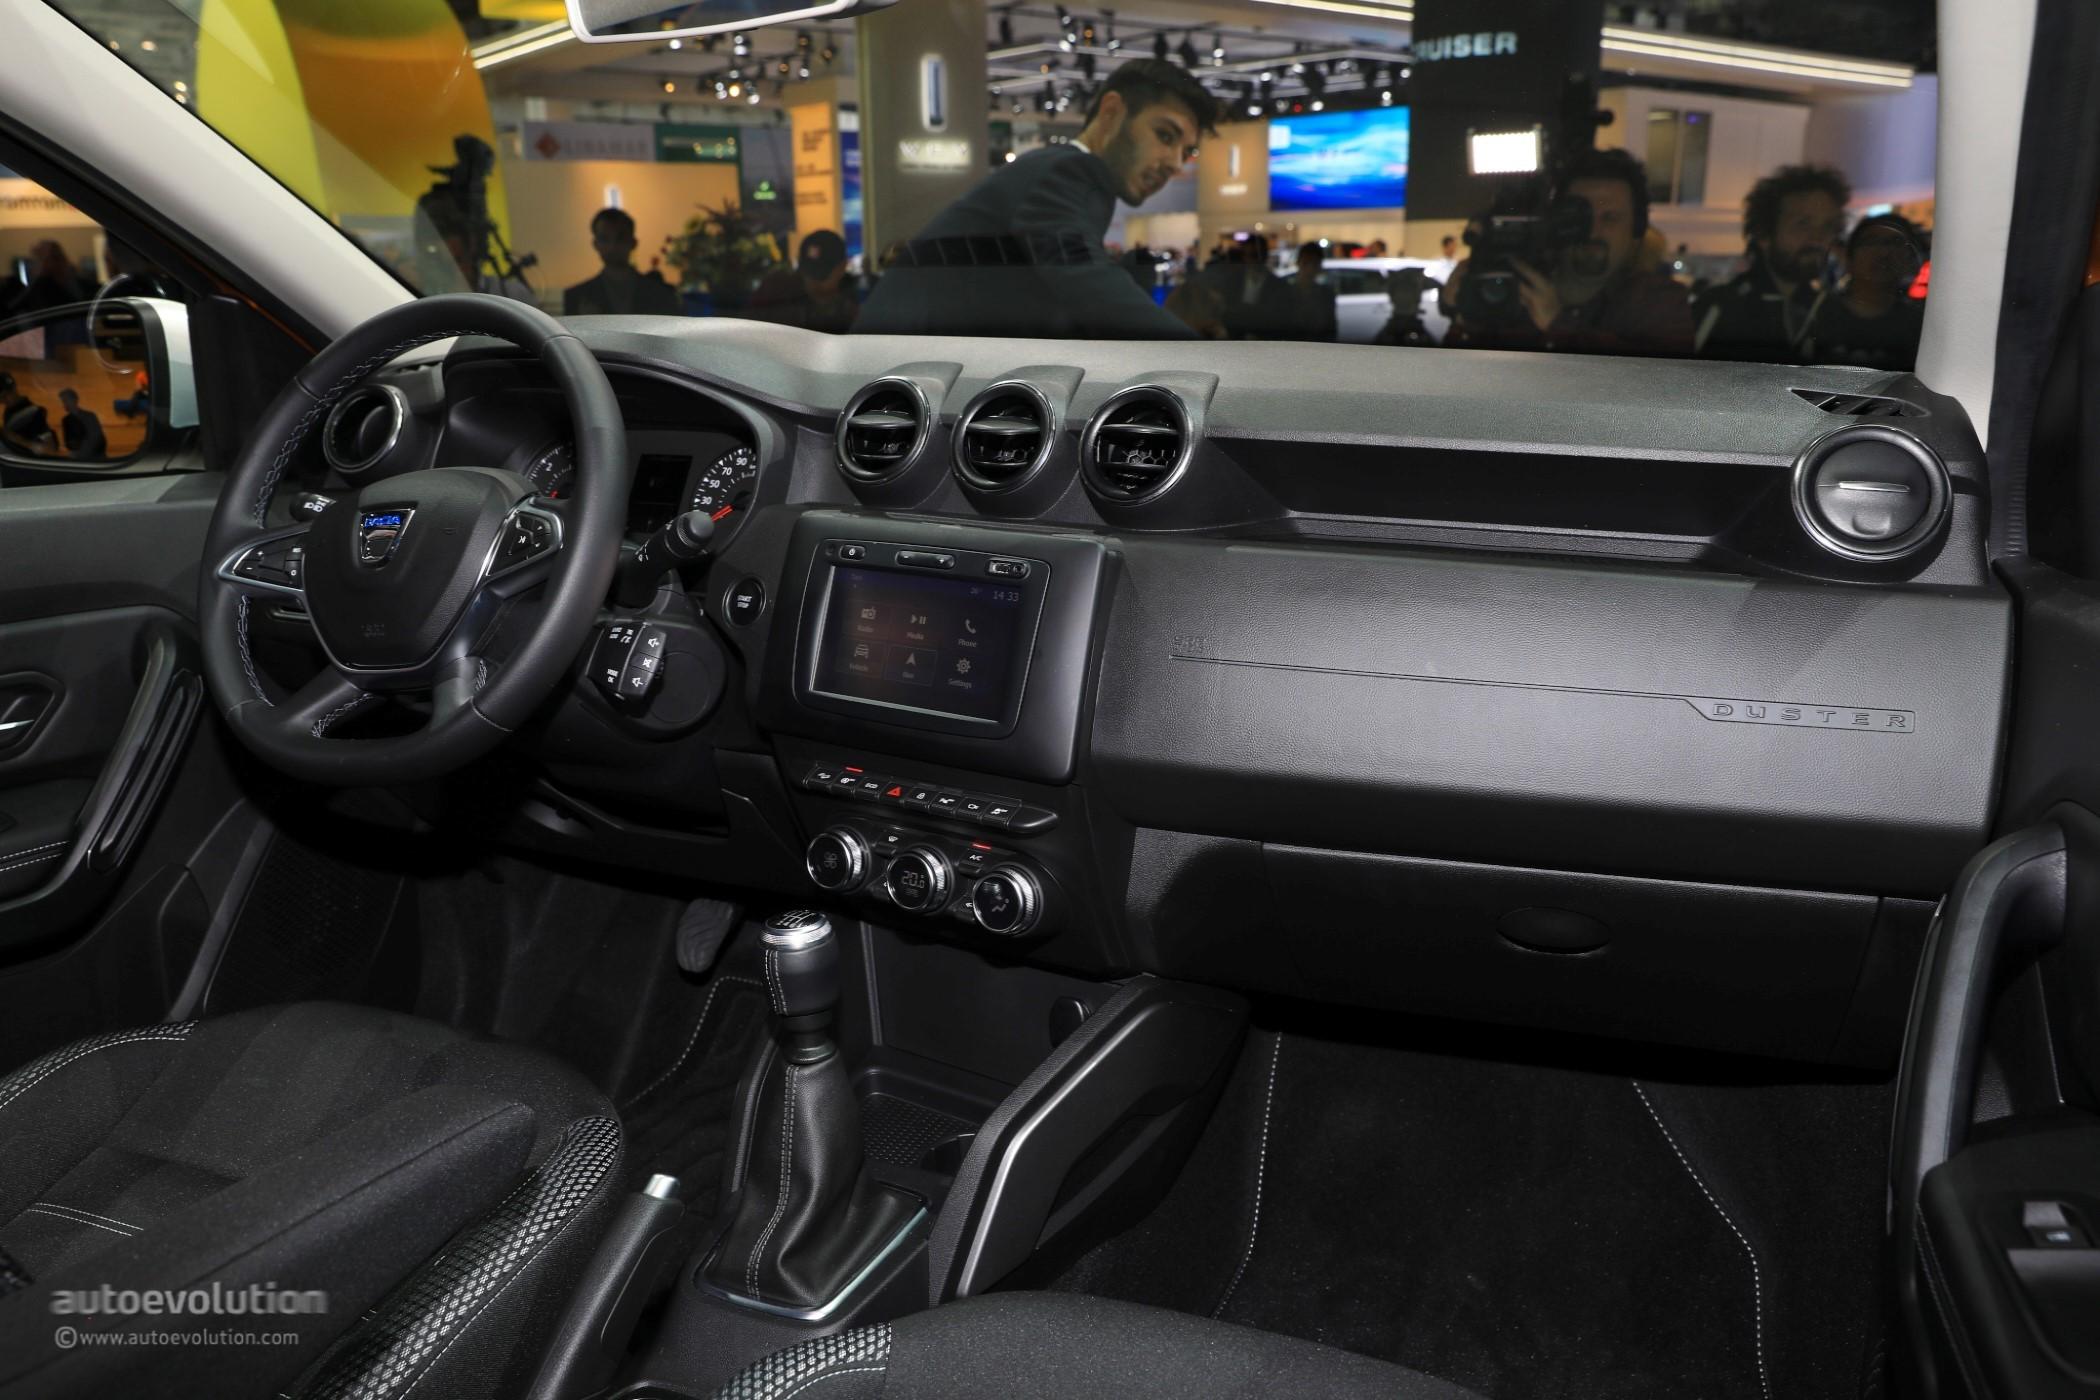 Dacia Pickup 2017 >> 2017 Dacia Duster Pickup Rendering Looks Like The Small Truck You